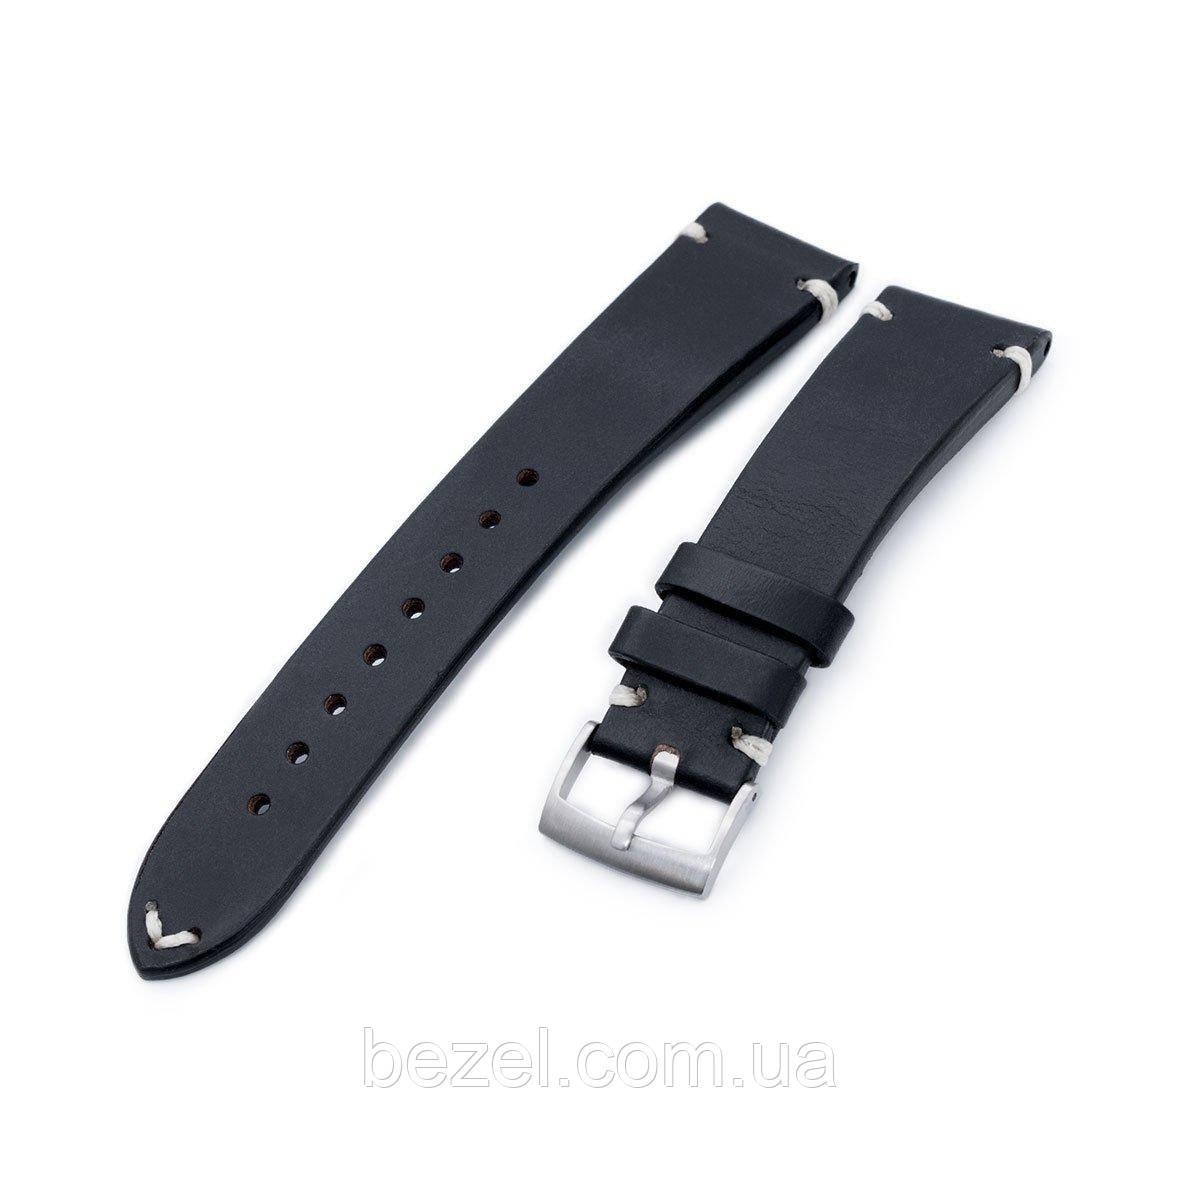 20mm, 21mm, 22mm MiLTAT Horween Chromexcel Watch Strap, Color Black, Beige Stitching